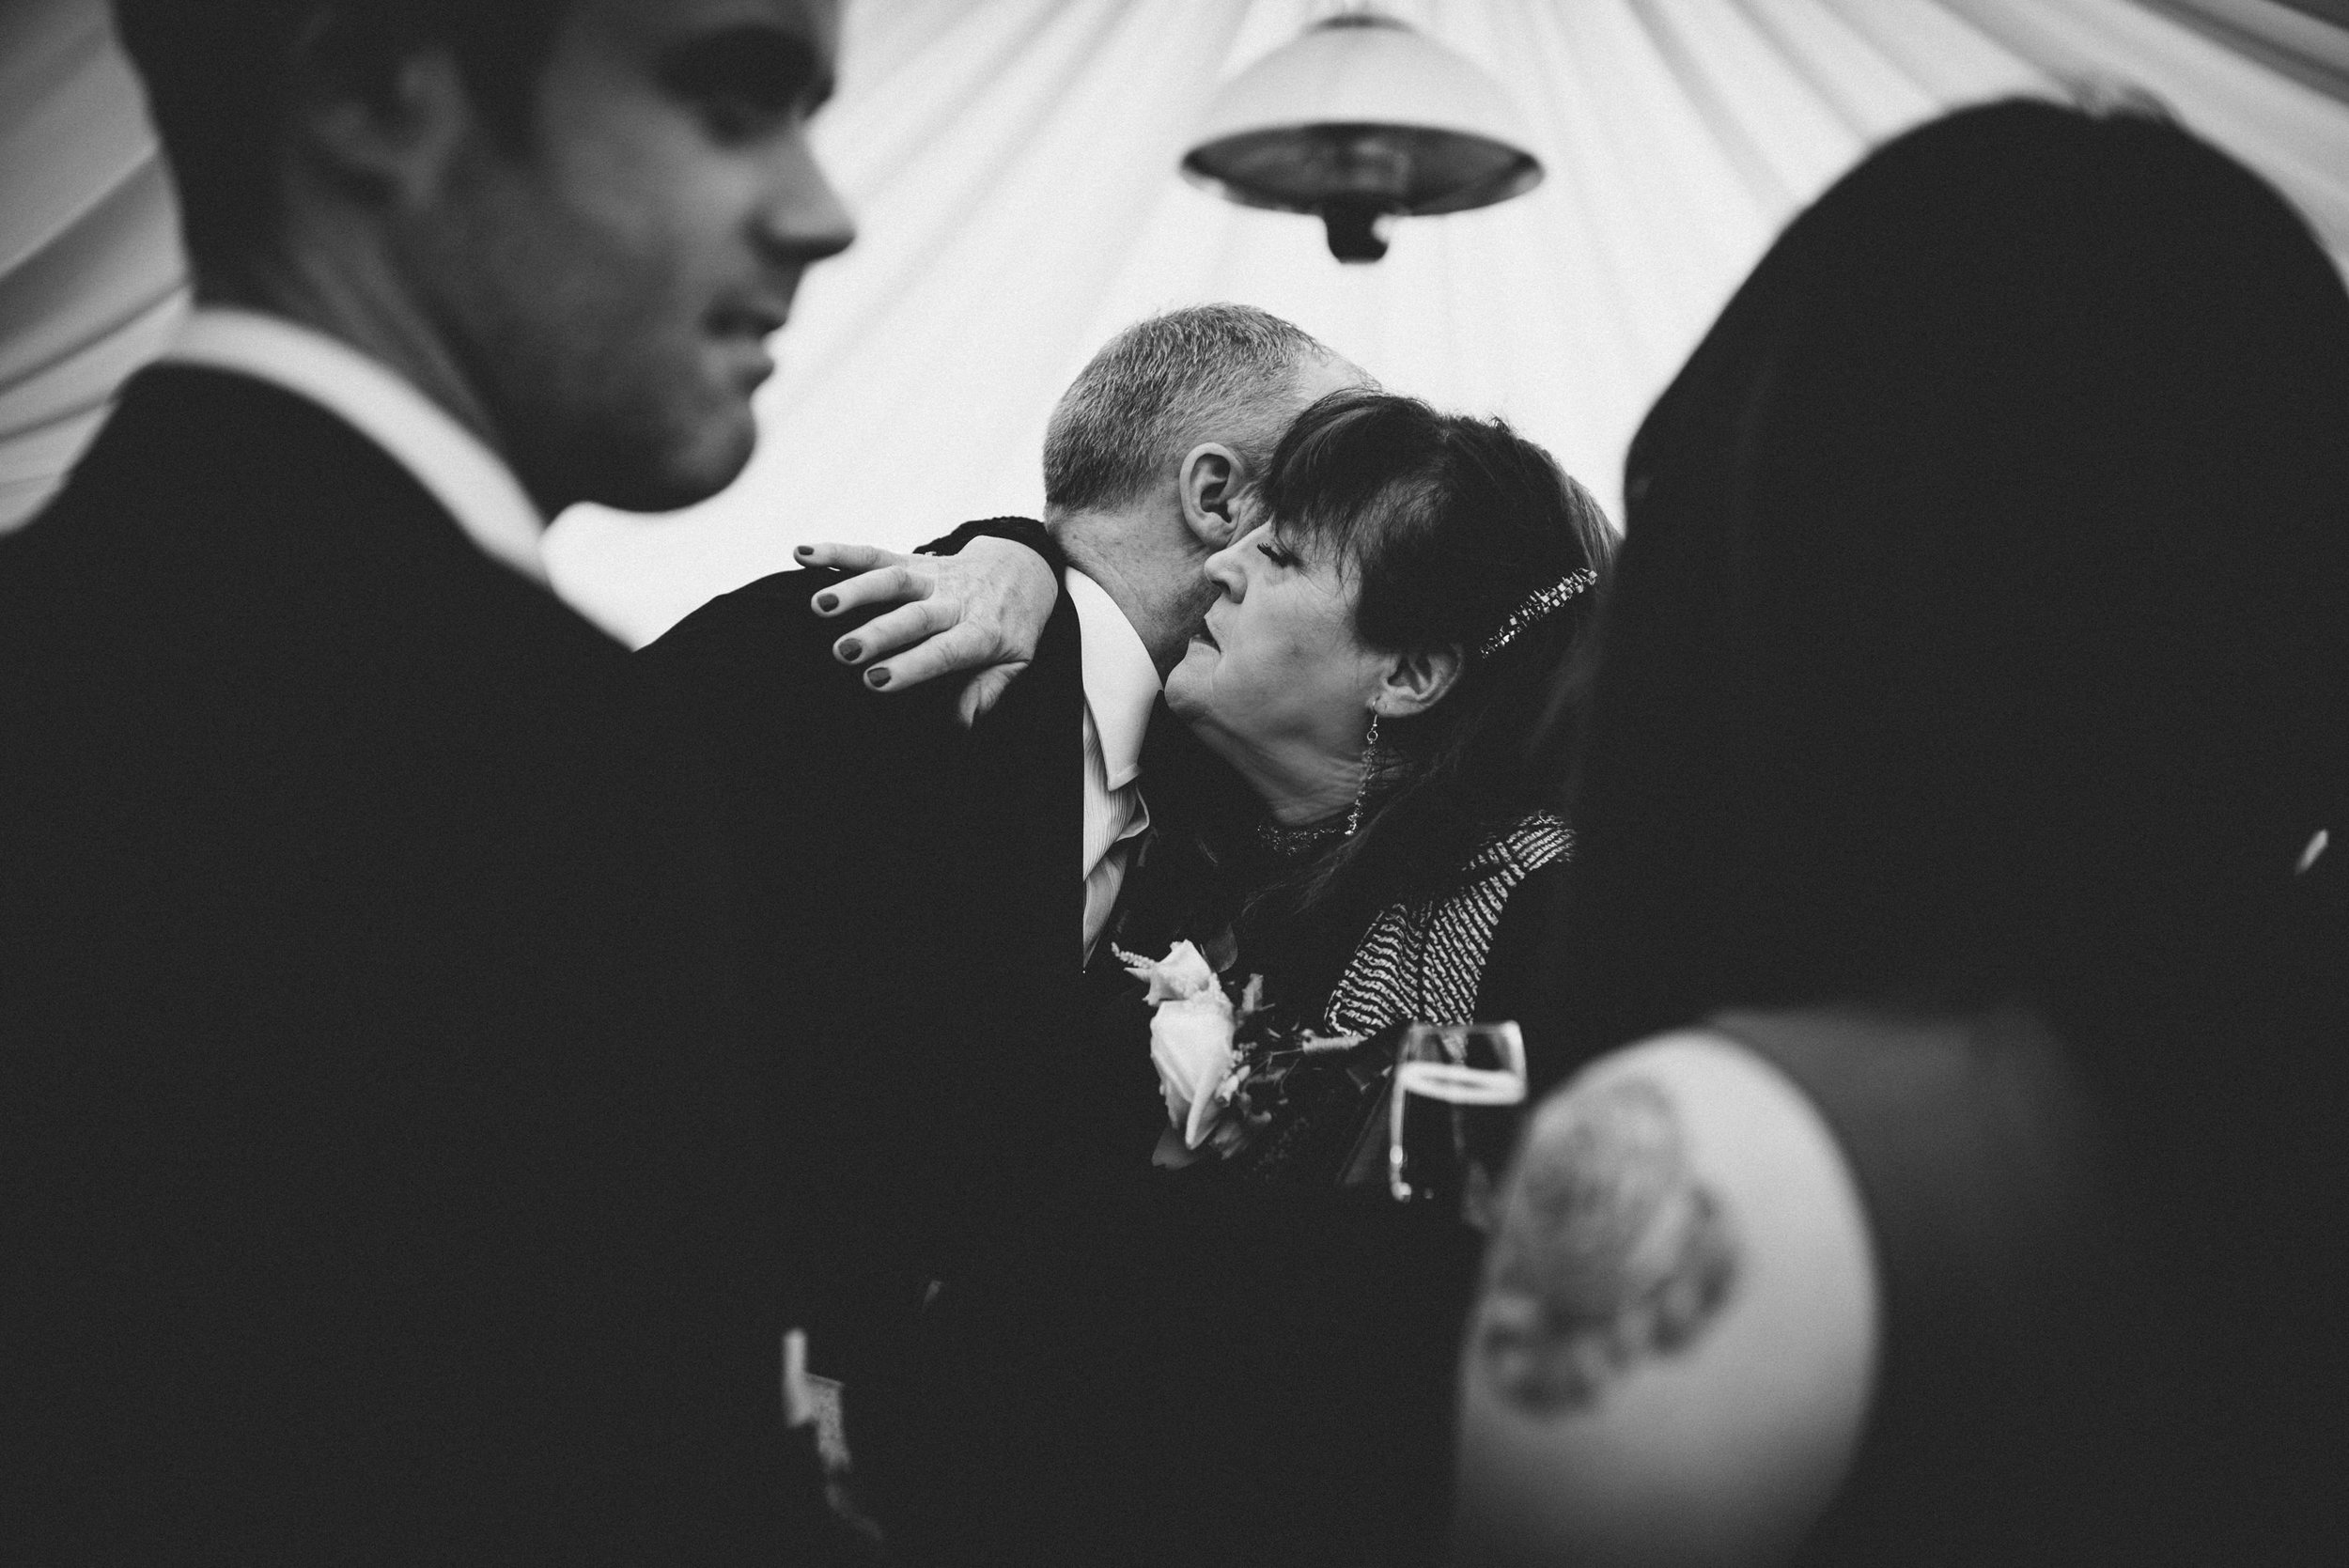 0035-LISA-DEVINE-PHOTOGRAPHY-ALTERNATIVE-WEDDING-PHOTOGRAPHY-SCOTLAND-DESTINATION-WEDDINGS-GLASGOW-WEDDINGS-COOL-WEDDINGS-STYLISH-WEDDINGS.JPG